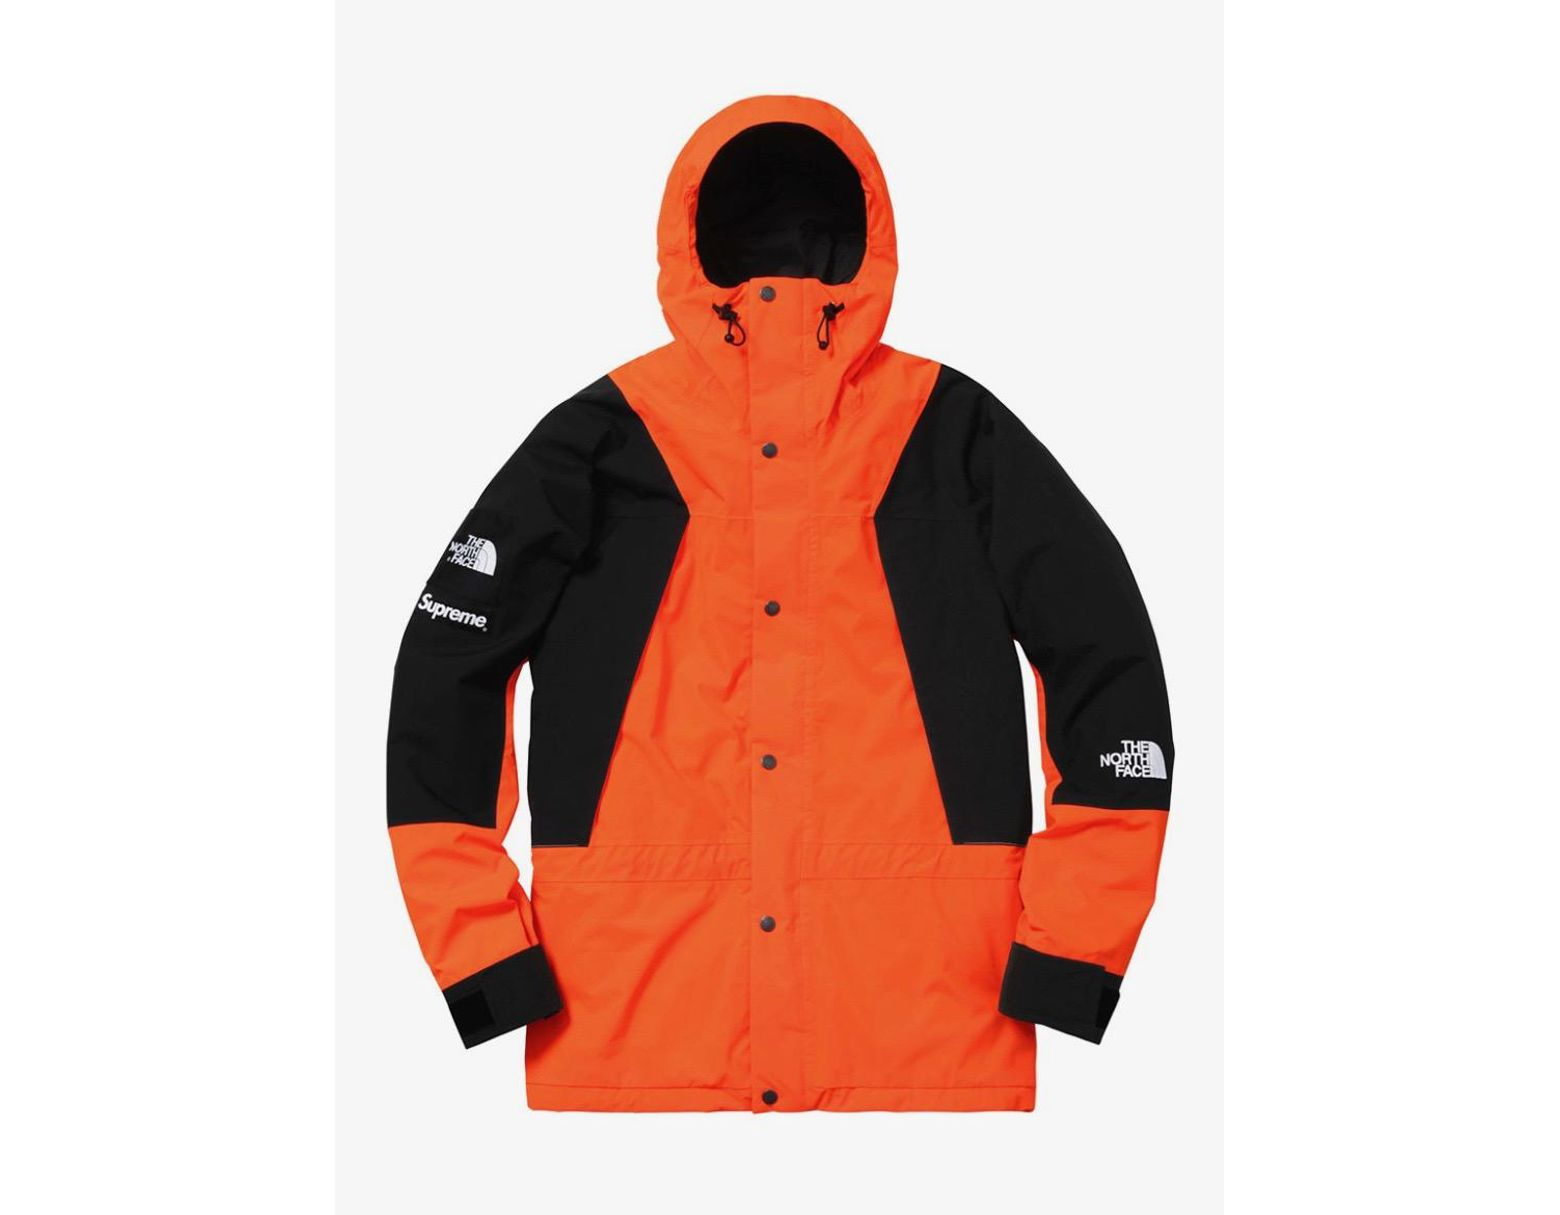 a9d51f5e Supreme The North Face Mountain Light Jacket Orange in Orange for Men - Lyst